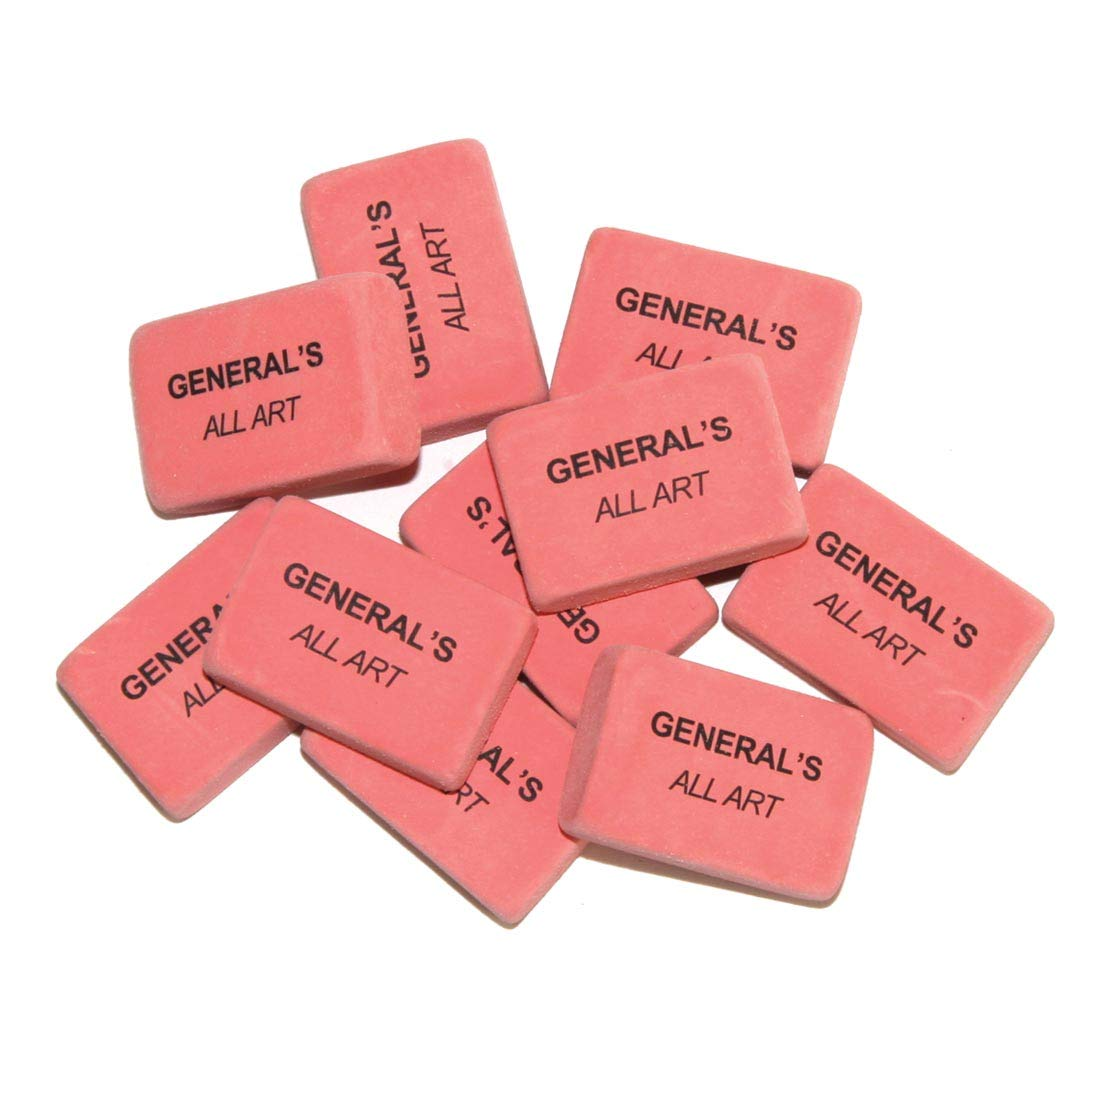 All-Art Eraser (Set of 250)